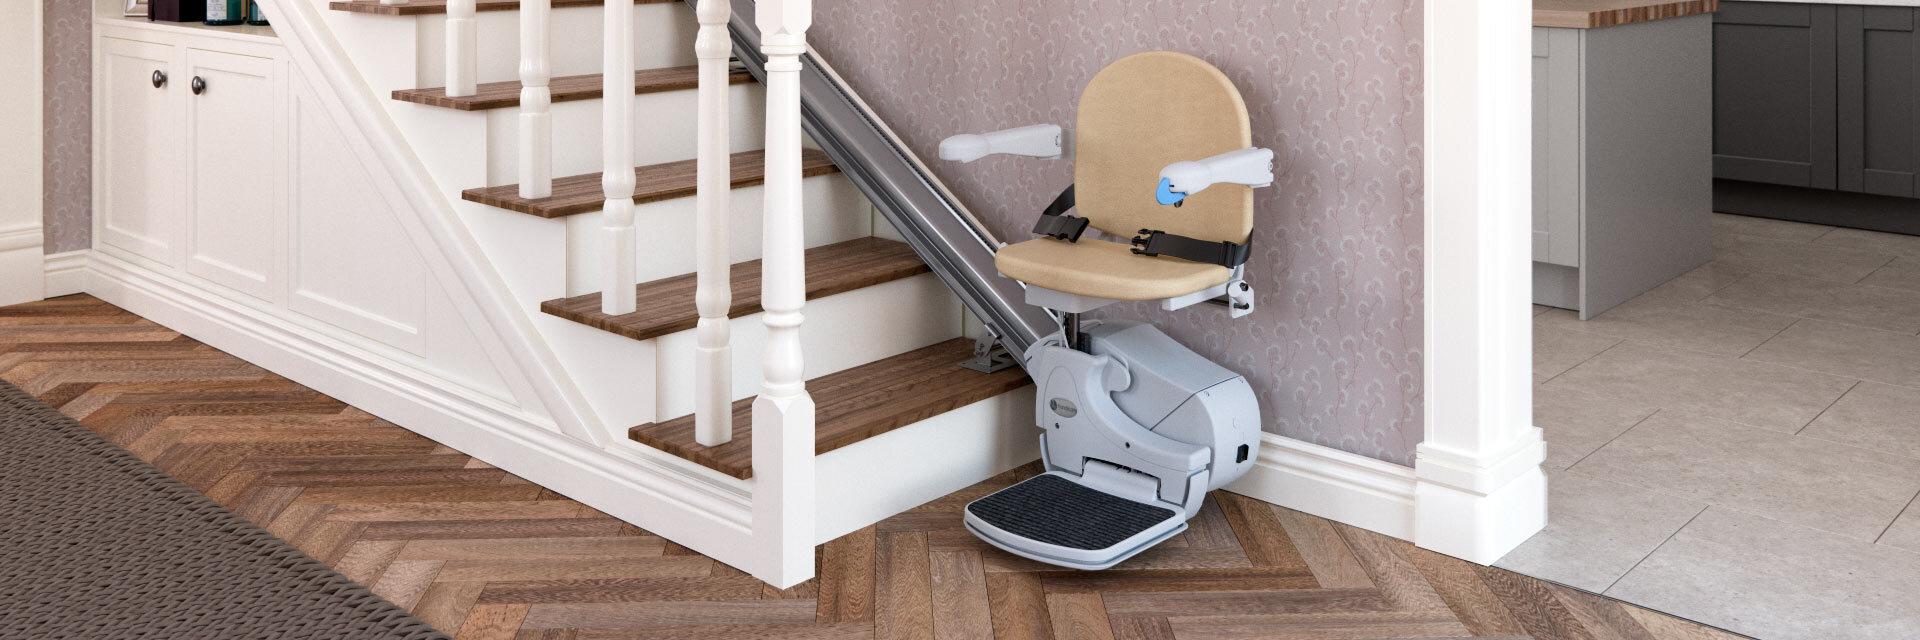 Straight Stairlift | Handicare 950 on